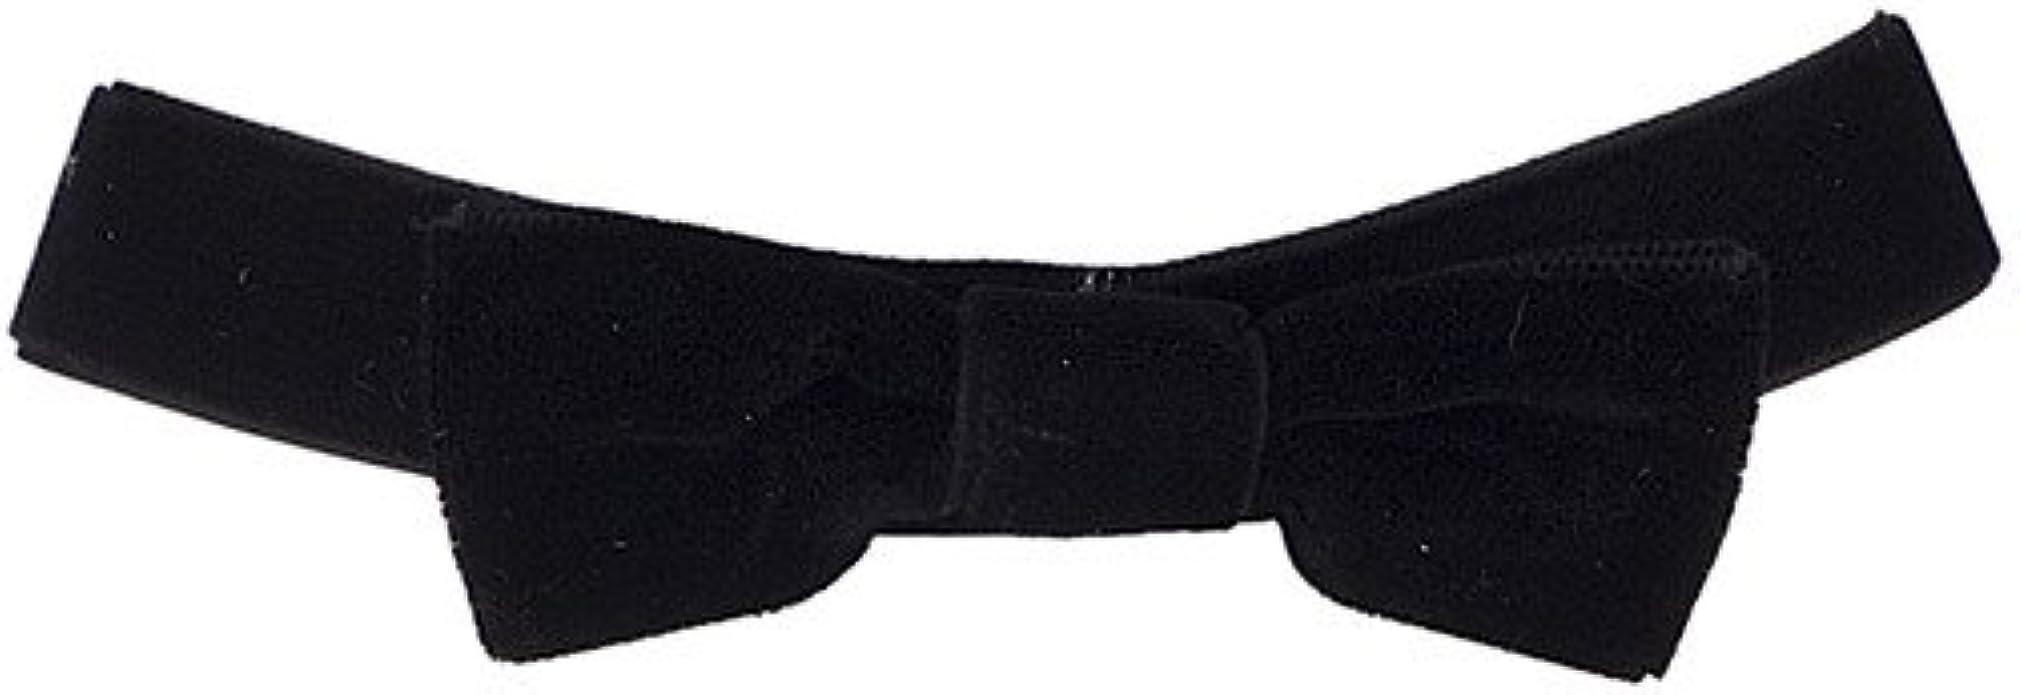 Black Fuzzy Wool Bowtie Velvet Choker Necklace Accessory SPP00026